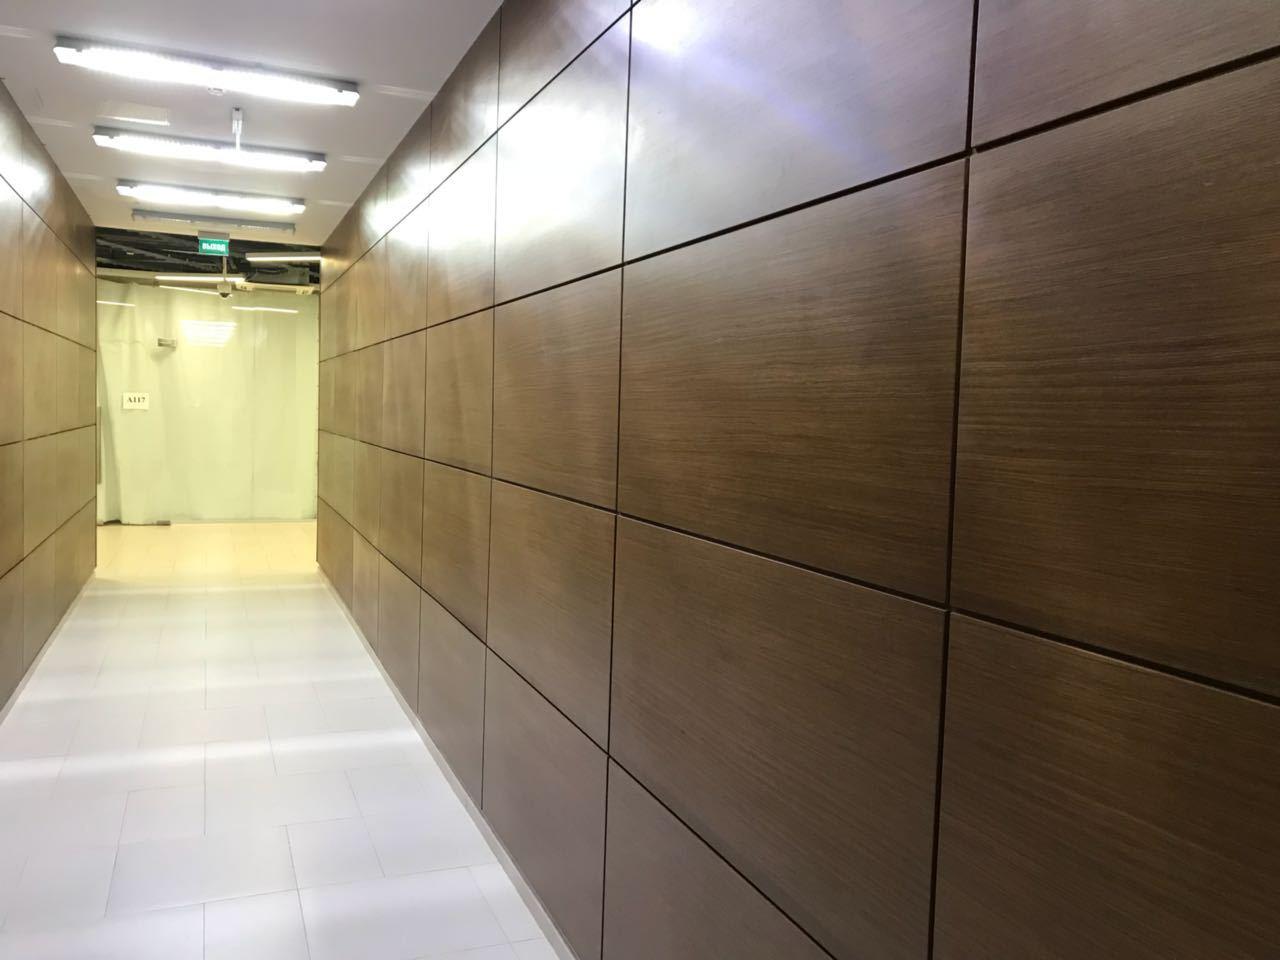 отделка стеновыми панелями во владивостоке фото регулярно посещает спортзал